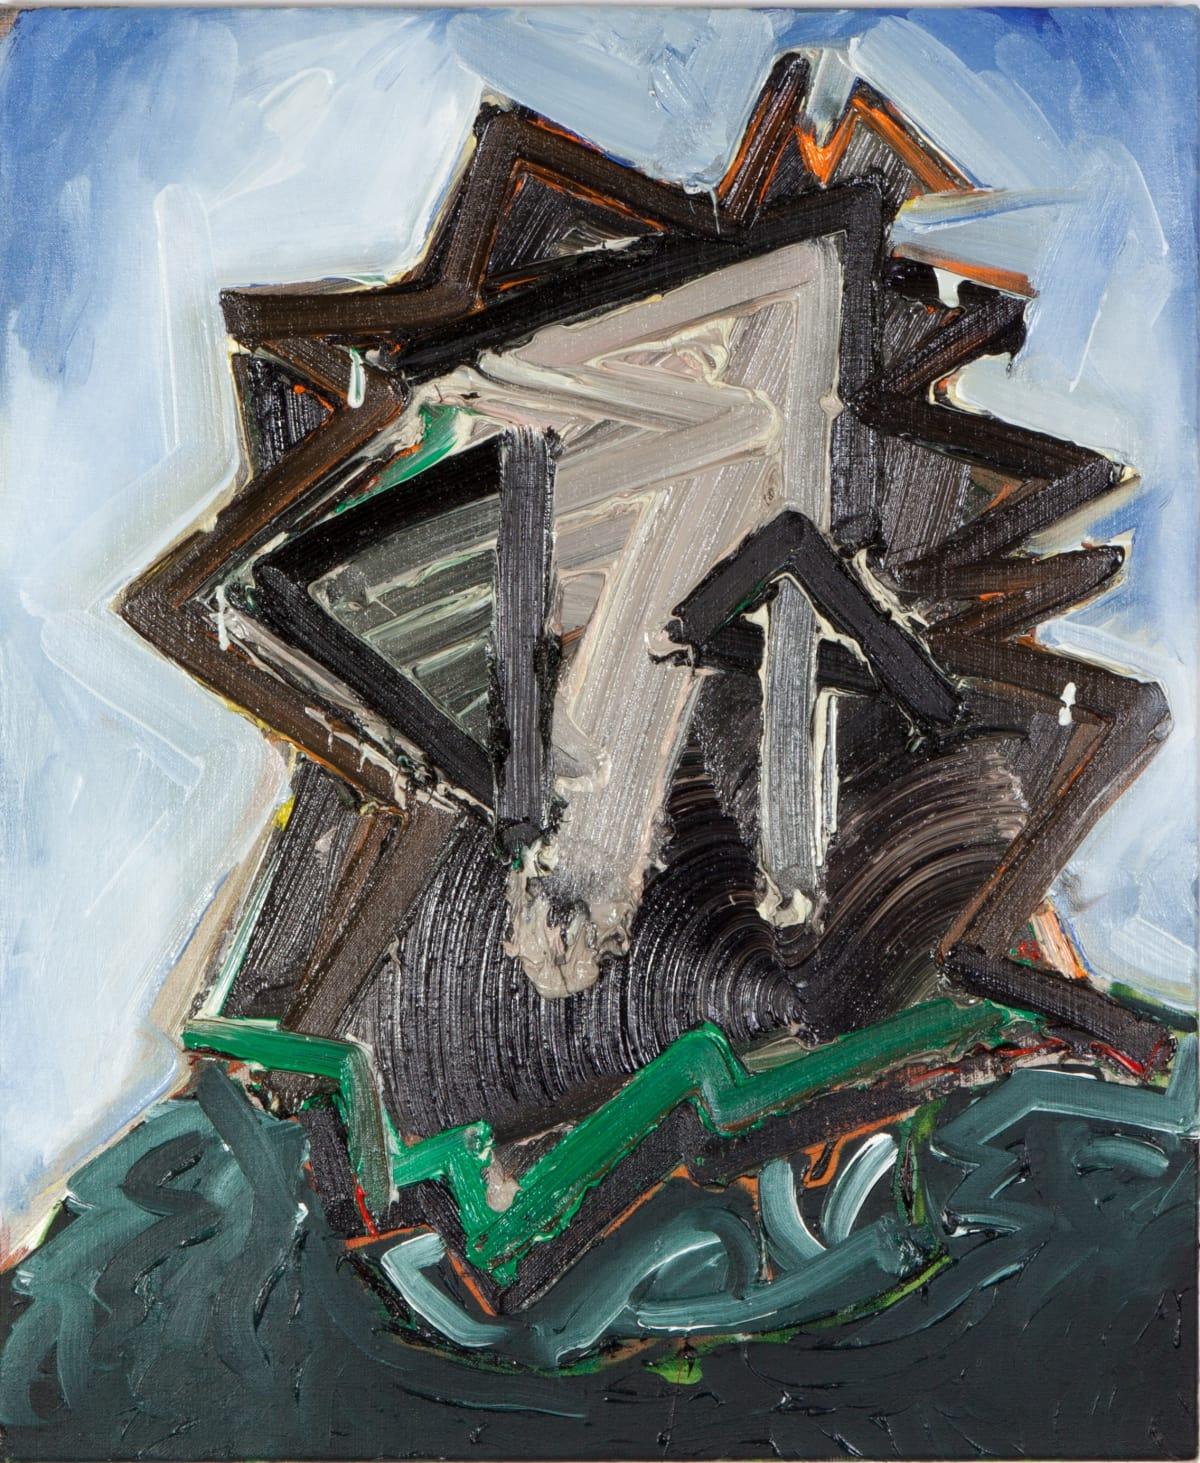 Toby Raine Judas - Harvey Keitel with Beard (Last Temptation of Christ), 2015 Oil on linen 23.8 x 19.9 in 60.5 x 50.5 cm